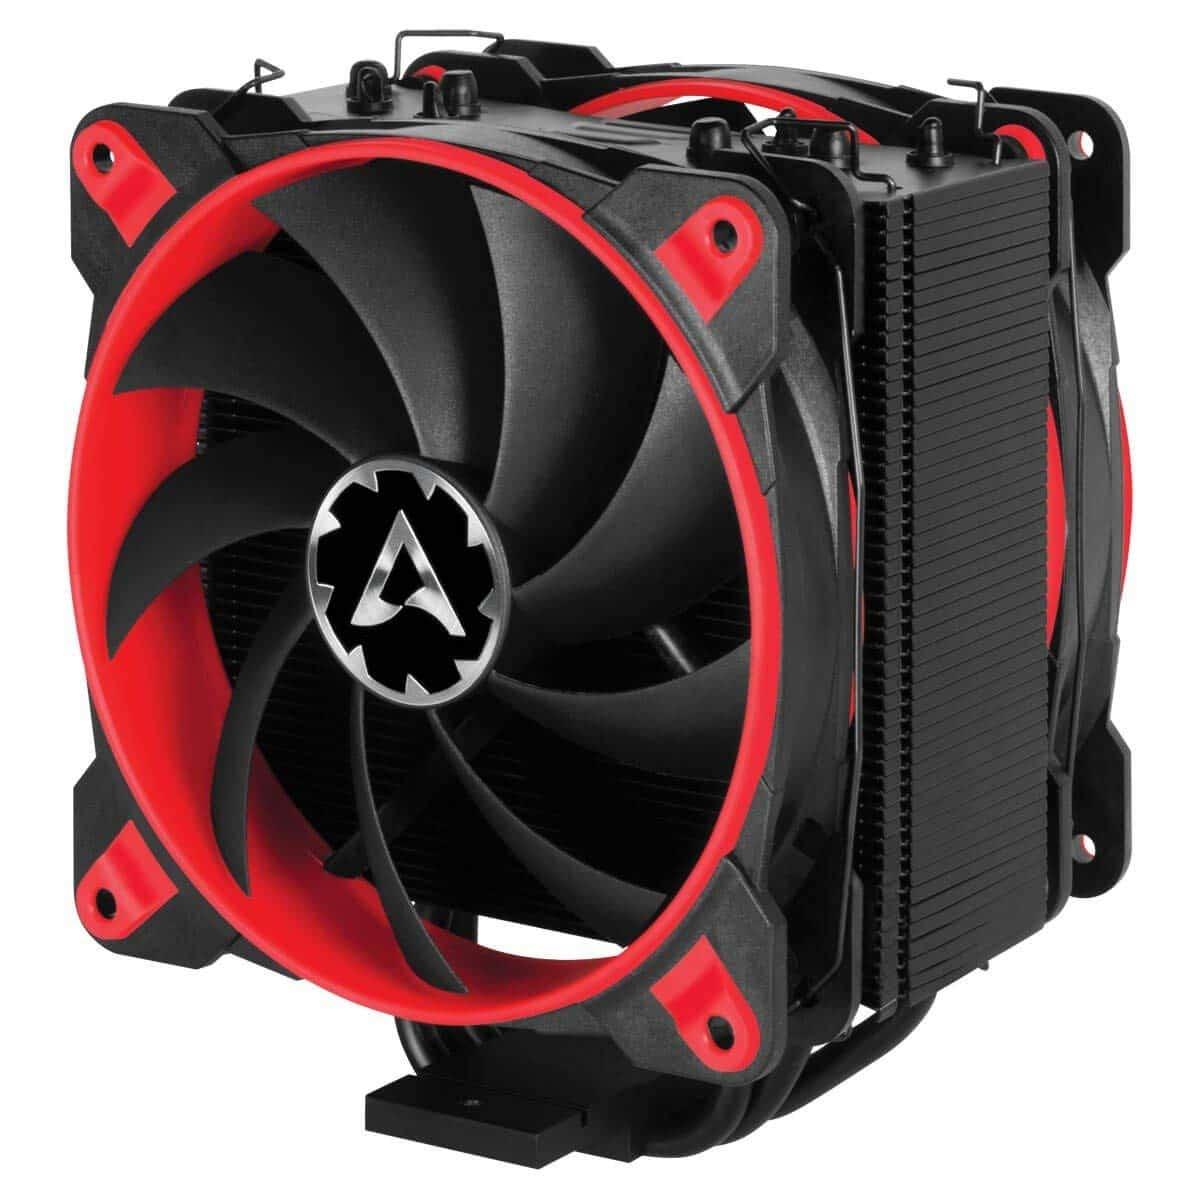 Arctic 33 eSports ONE Edition Heatsink & Fan, Black & Red, Intel & AMD Sockets, Bionix Fan, Fluid Dynamic B